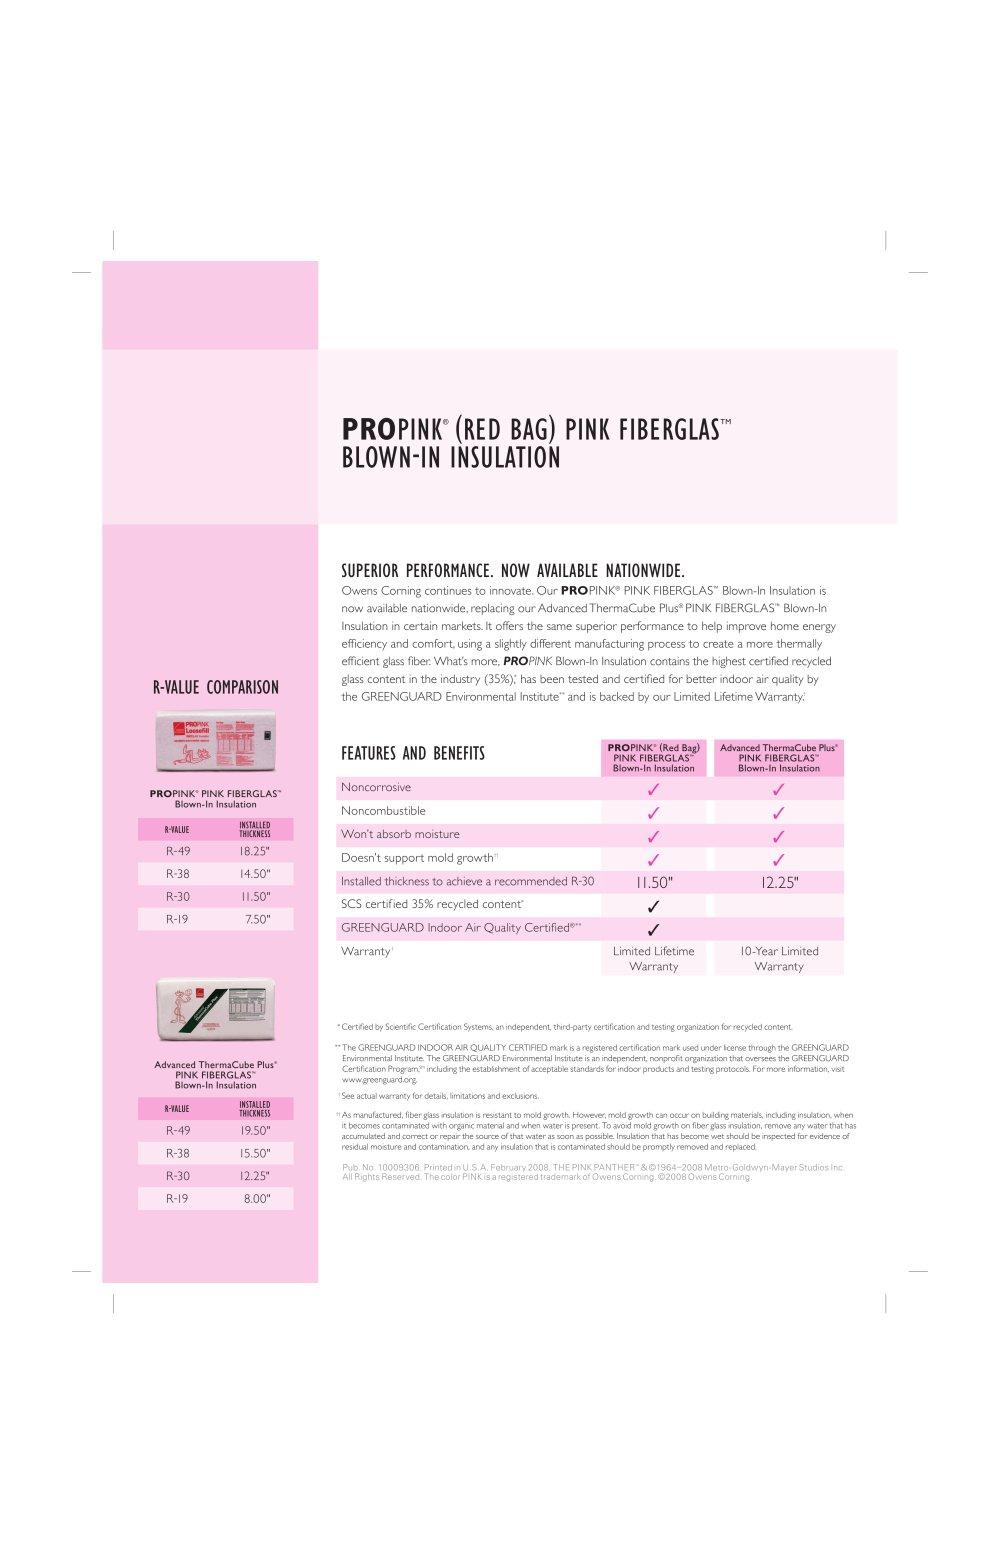 propink red bag pink fiberglas tm blownin insulation 1 1 pages